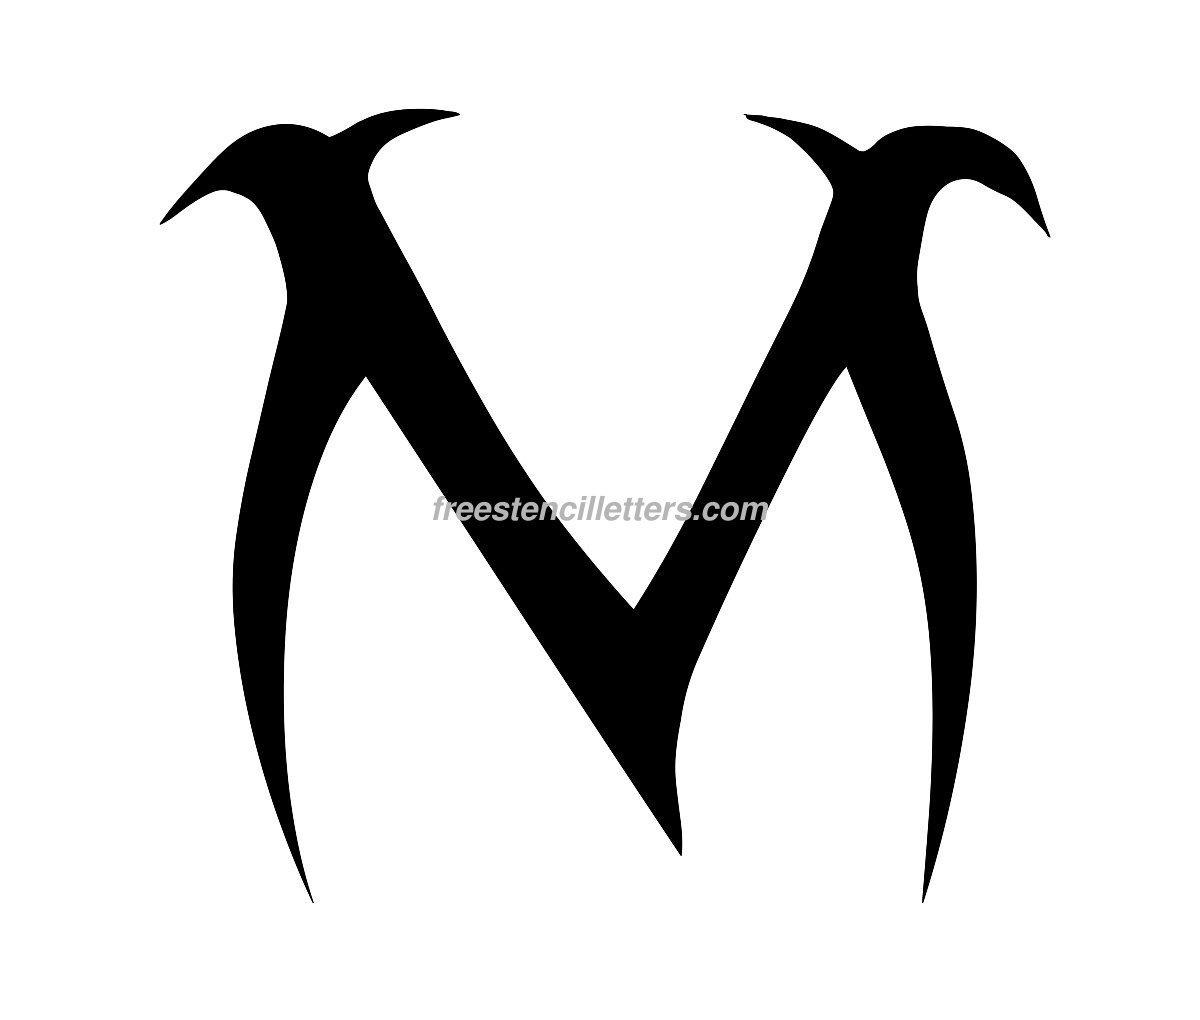 Worksheet Cursive Letter M 5 best images of fancy letter m stencil printable free stencil